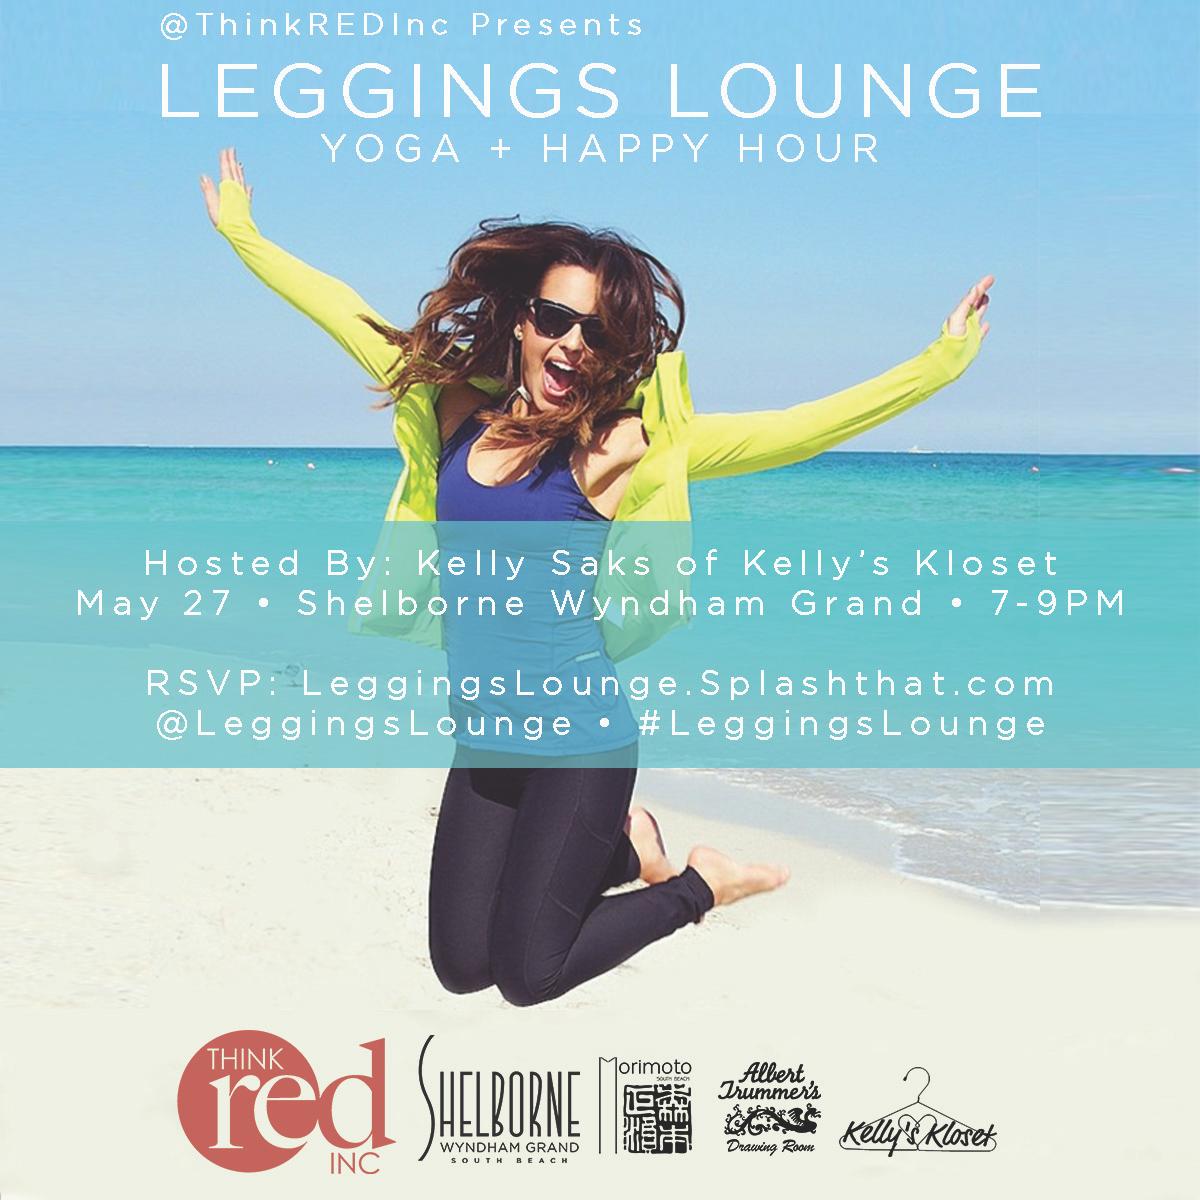 Leggings Lounge: Yoga + Happy Hour at Shelborne South Beach